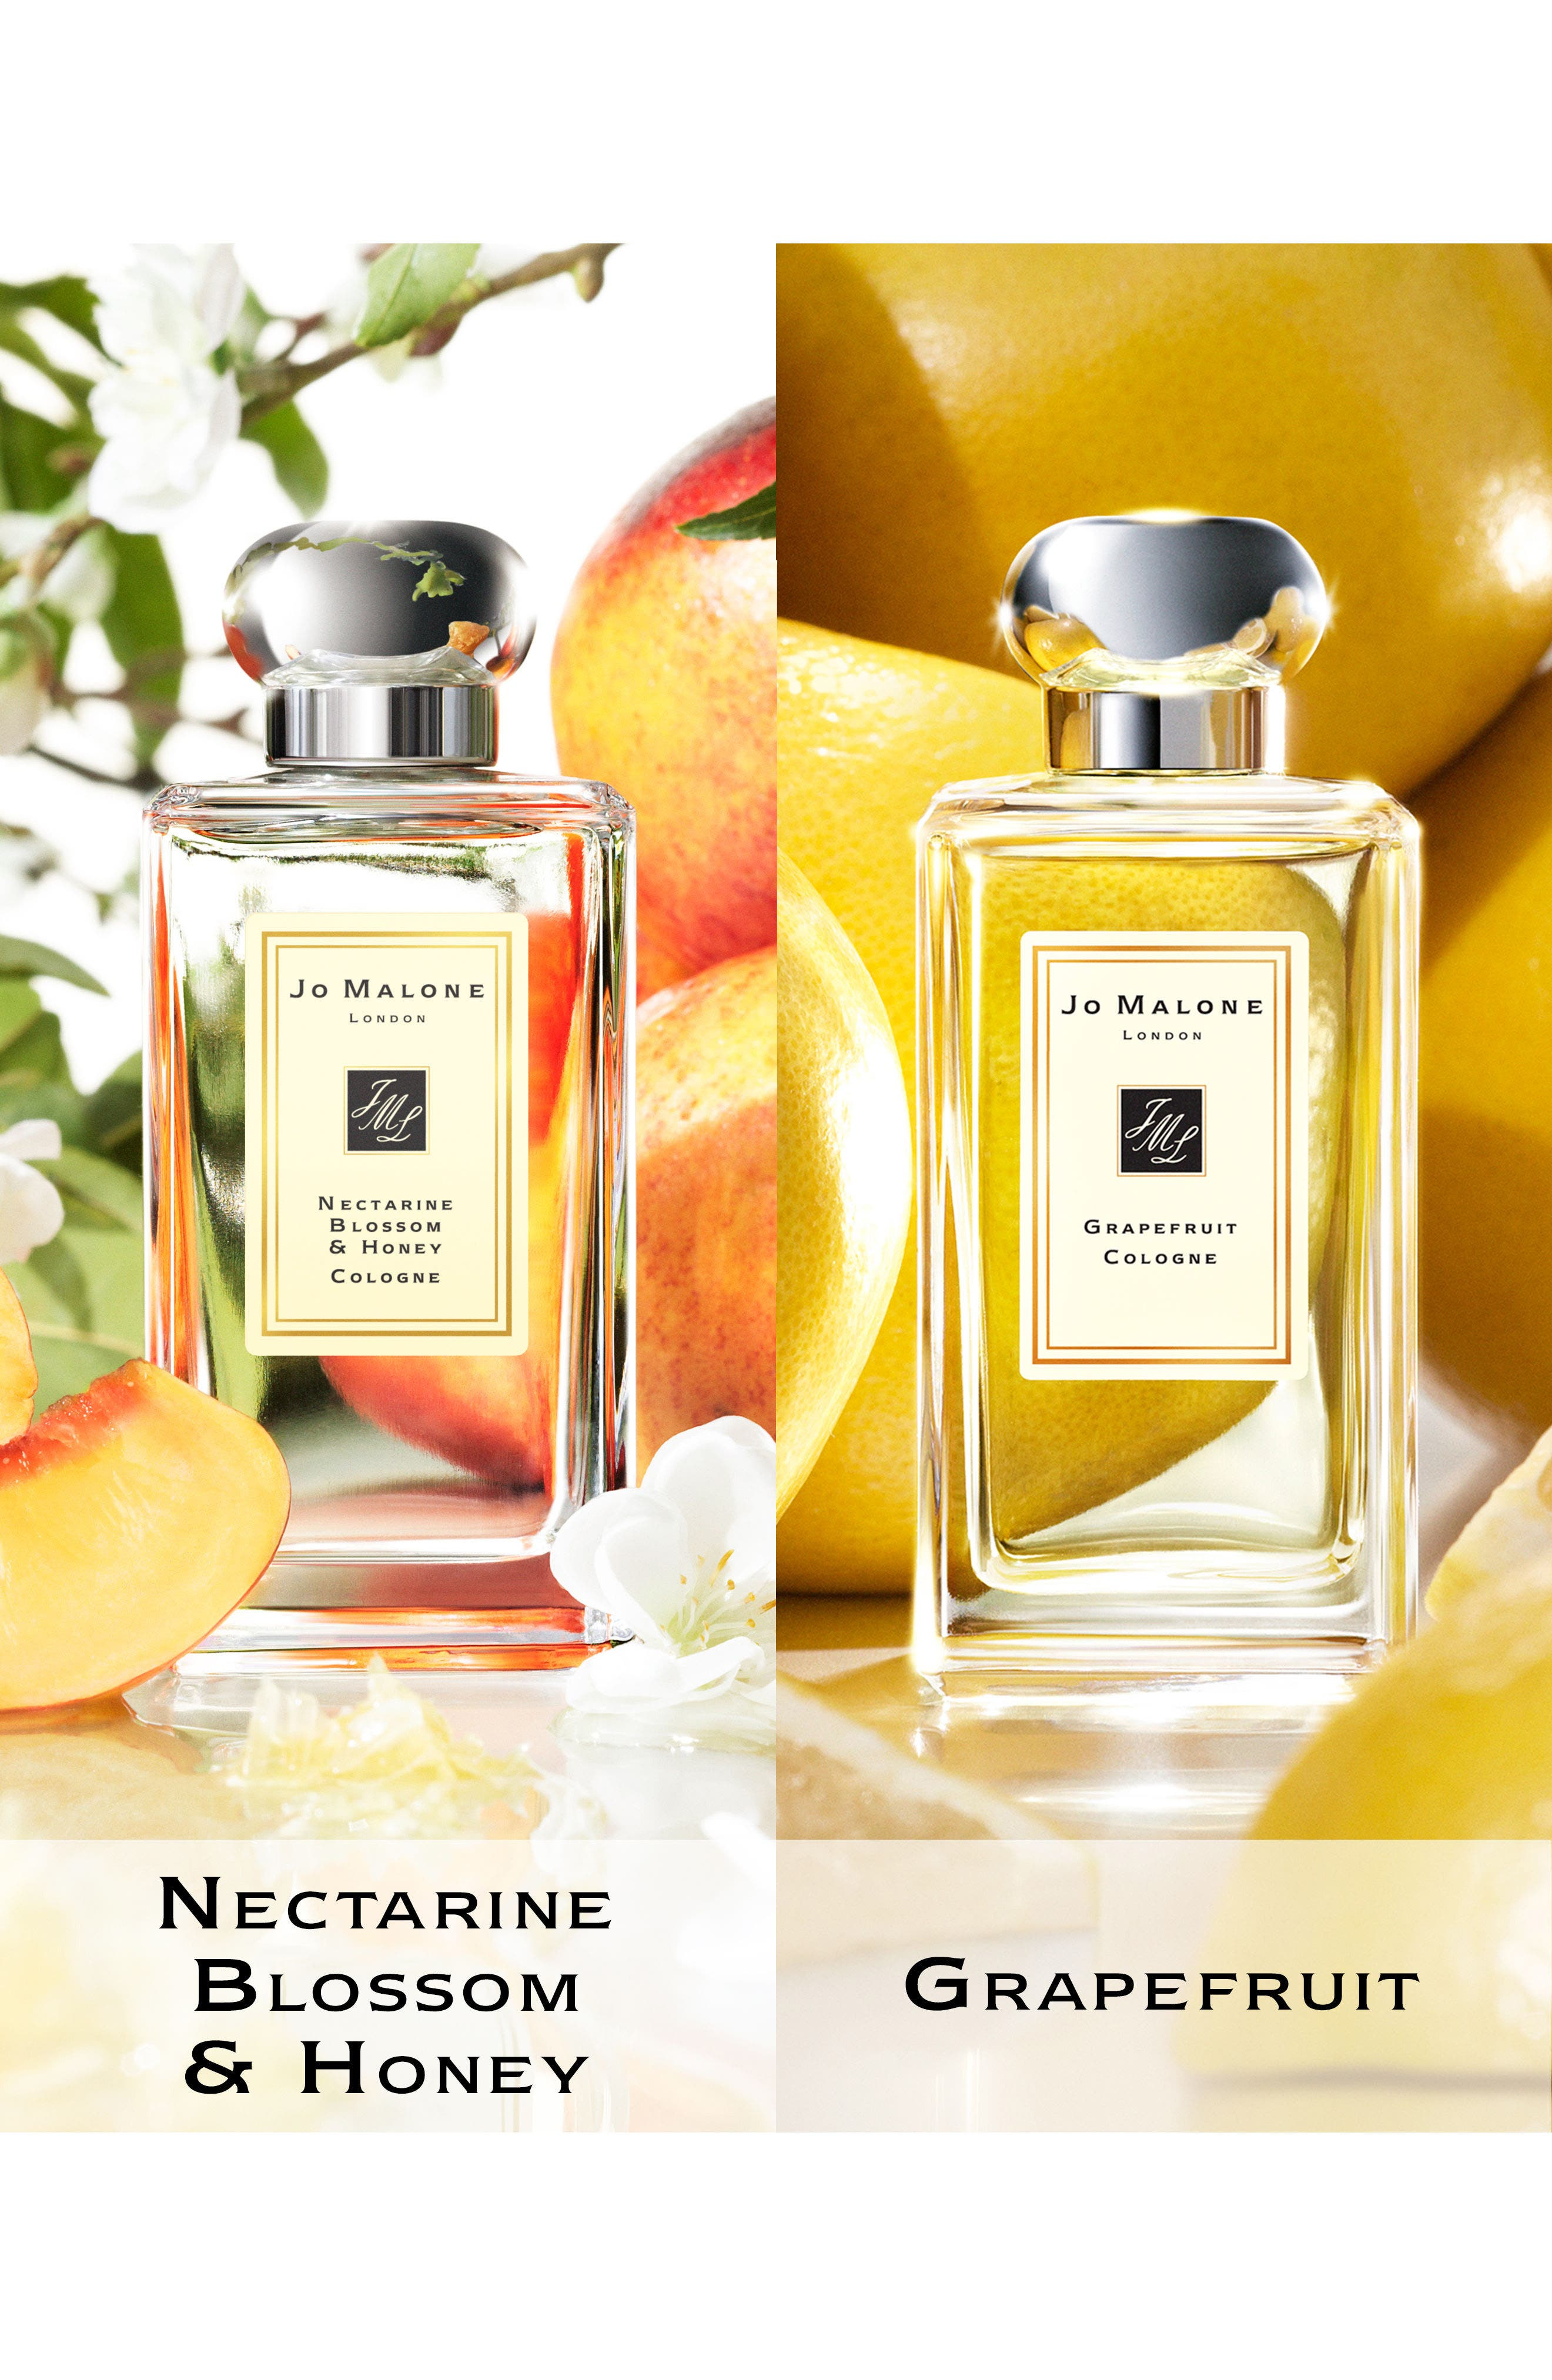 Jo Malone London™ Nectarine Blossom & Honey & Grapefruit